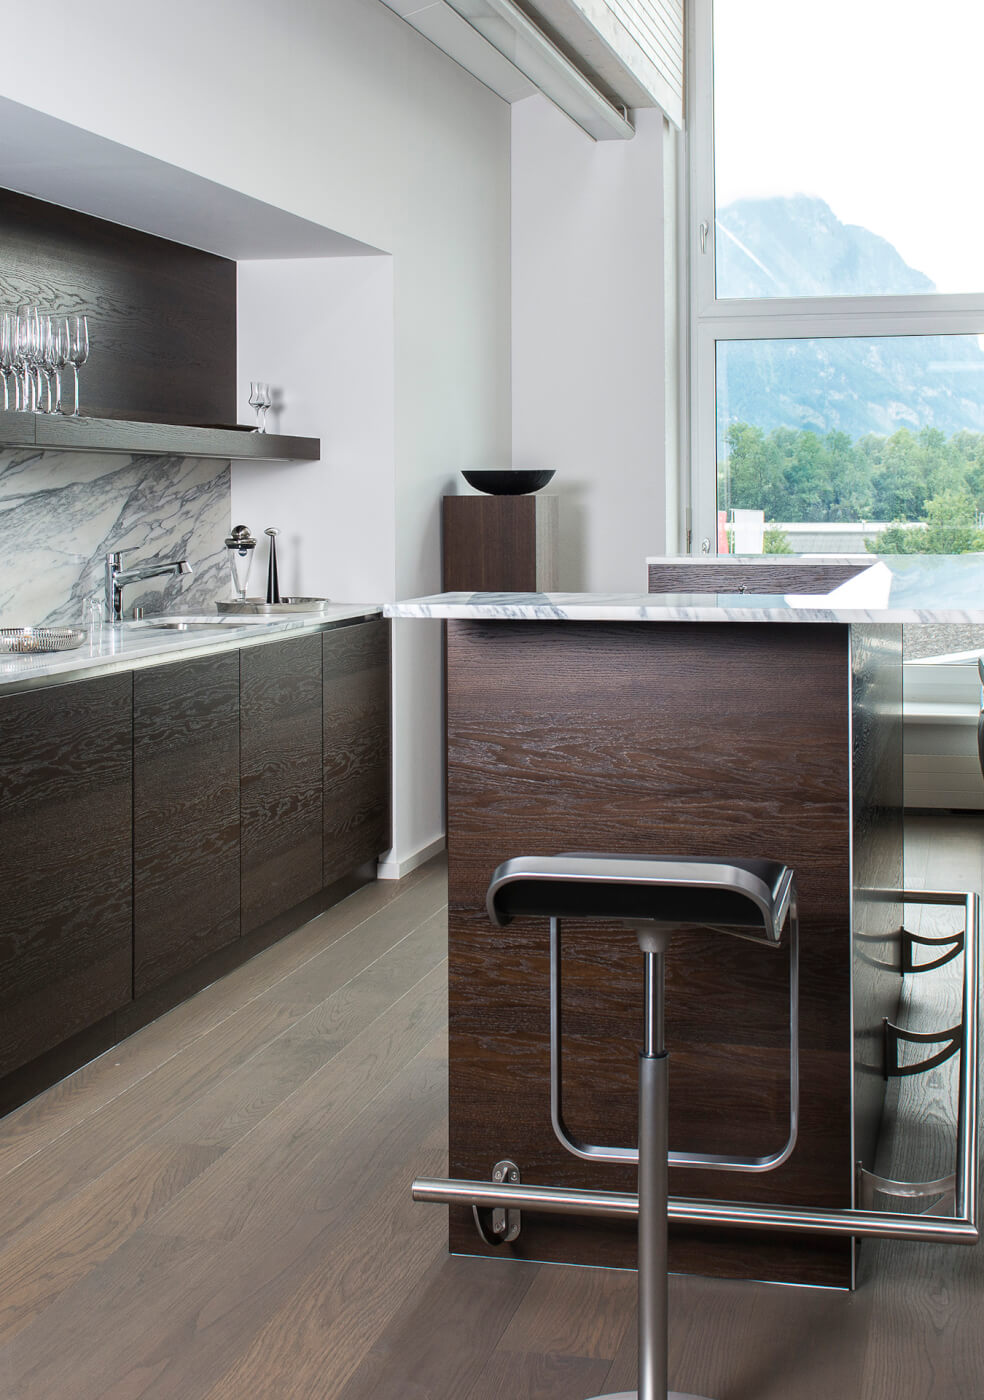 Küchen in Echtholzfurnier oder Massivholz